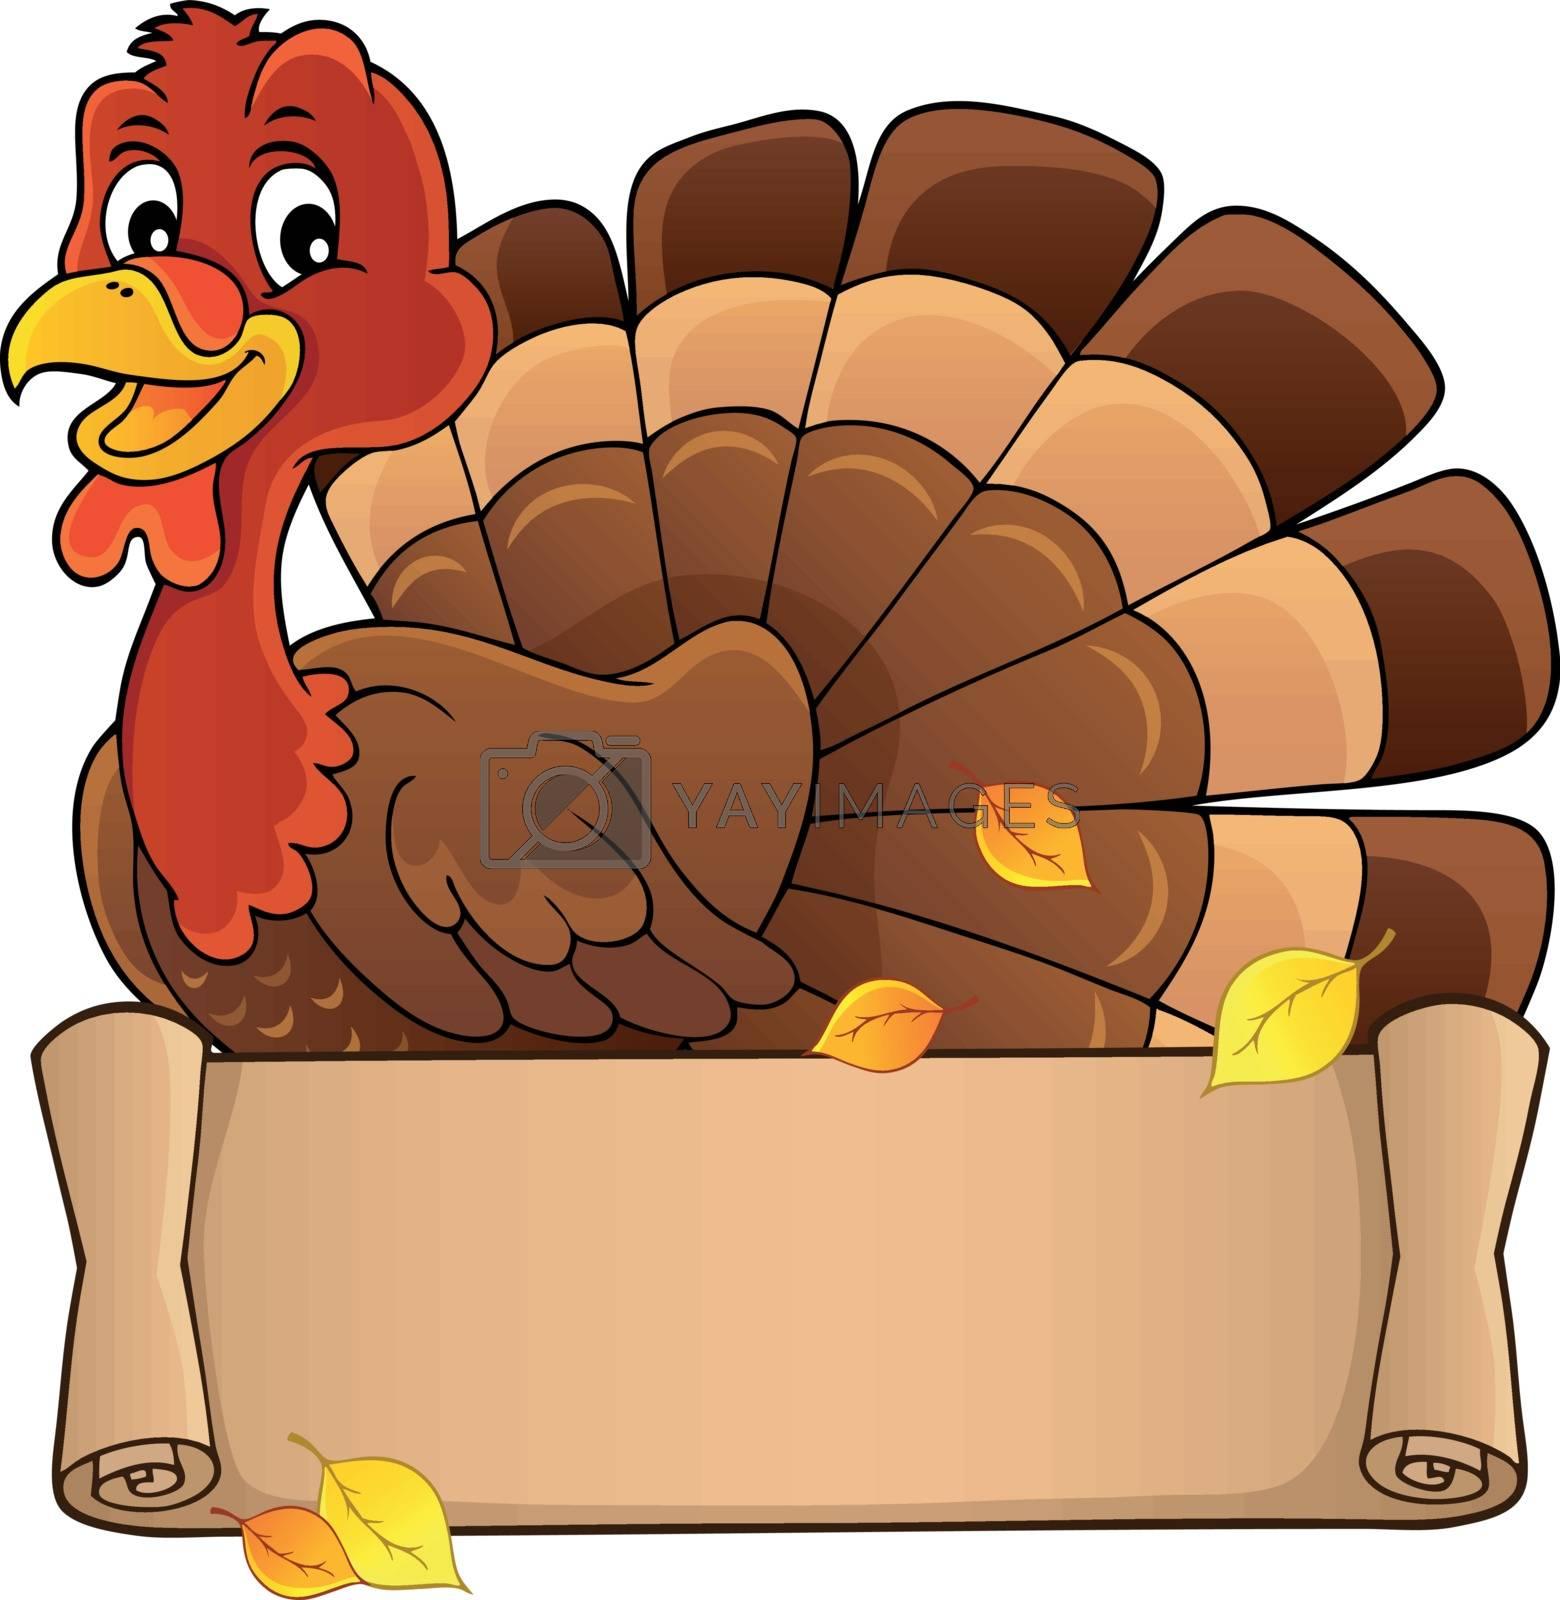 Turkey bird with banner theme 1 - eps10 vector illustration.